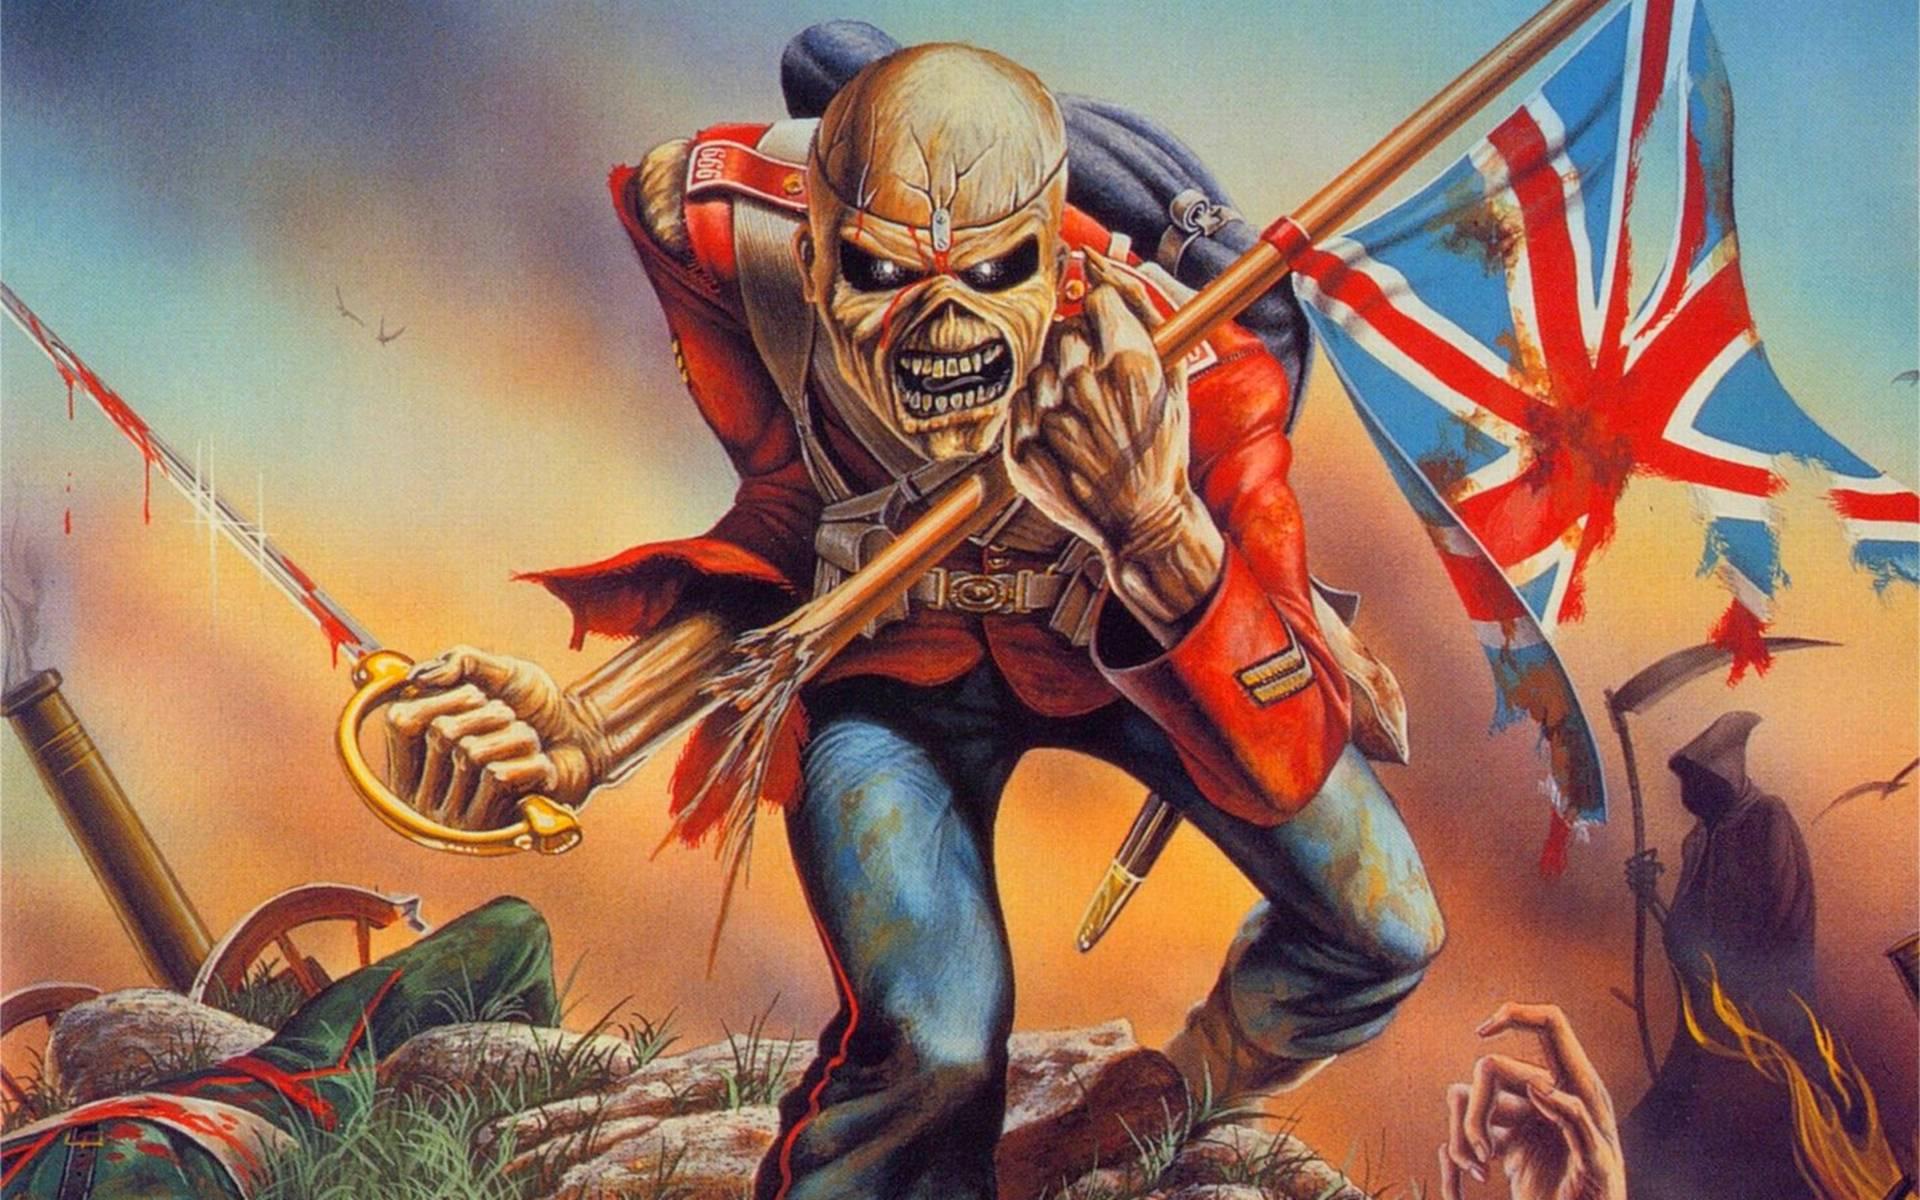 Iron Maiden wallpaper – Best Picture design For girls